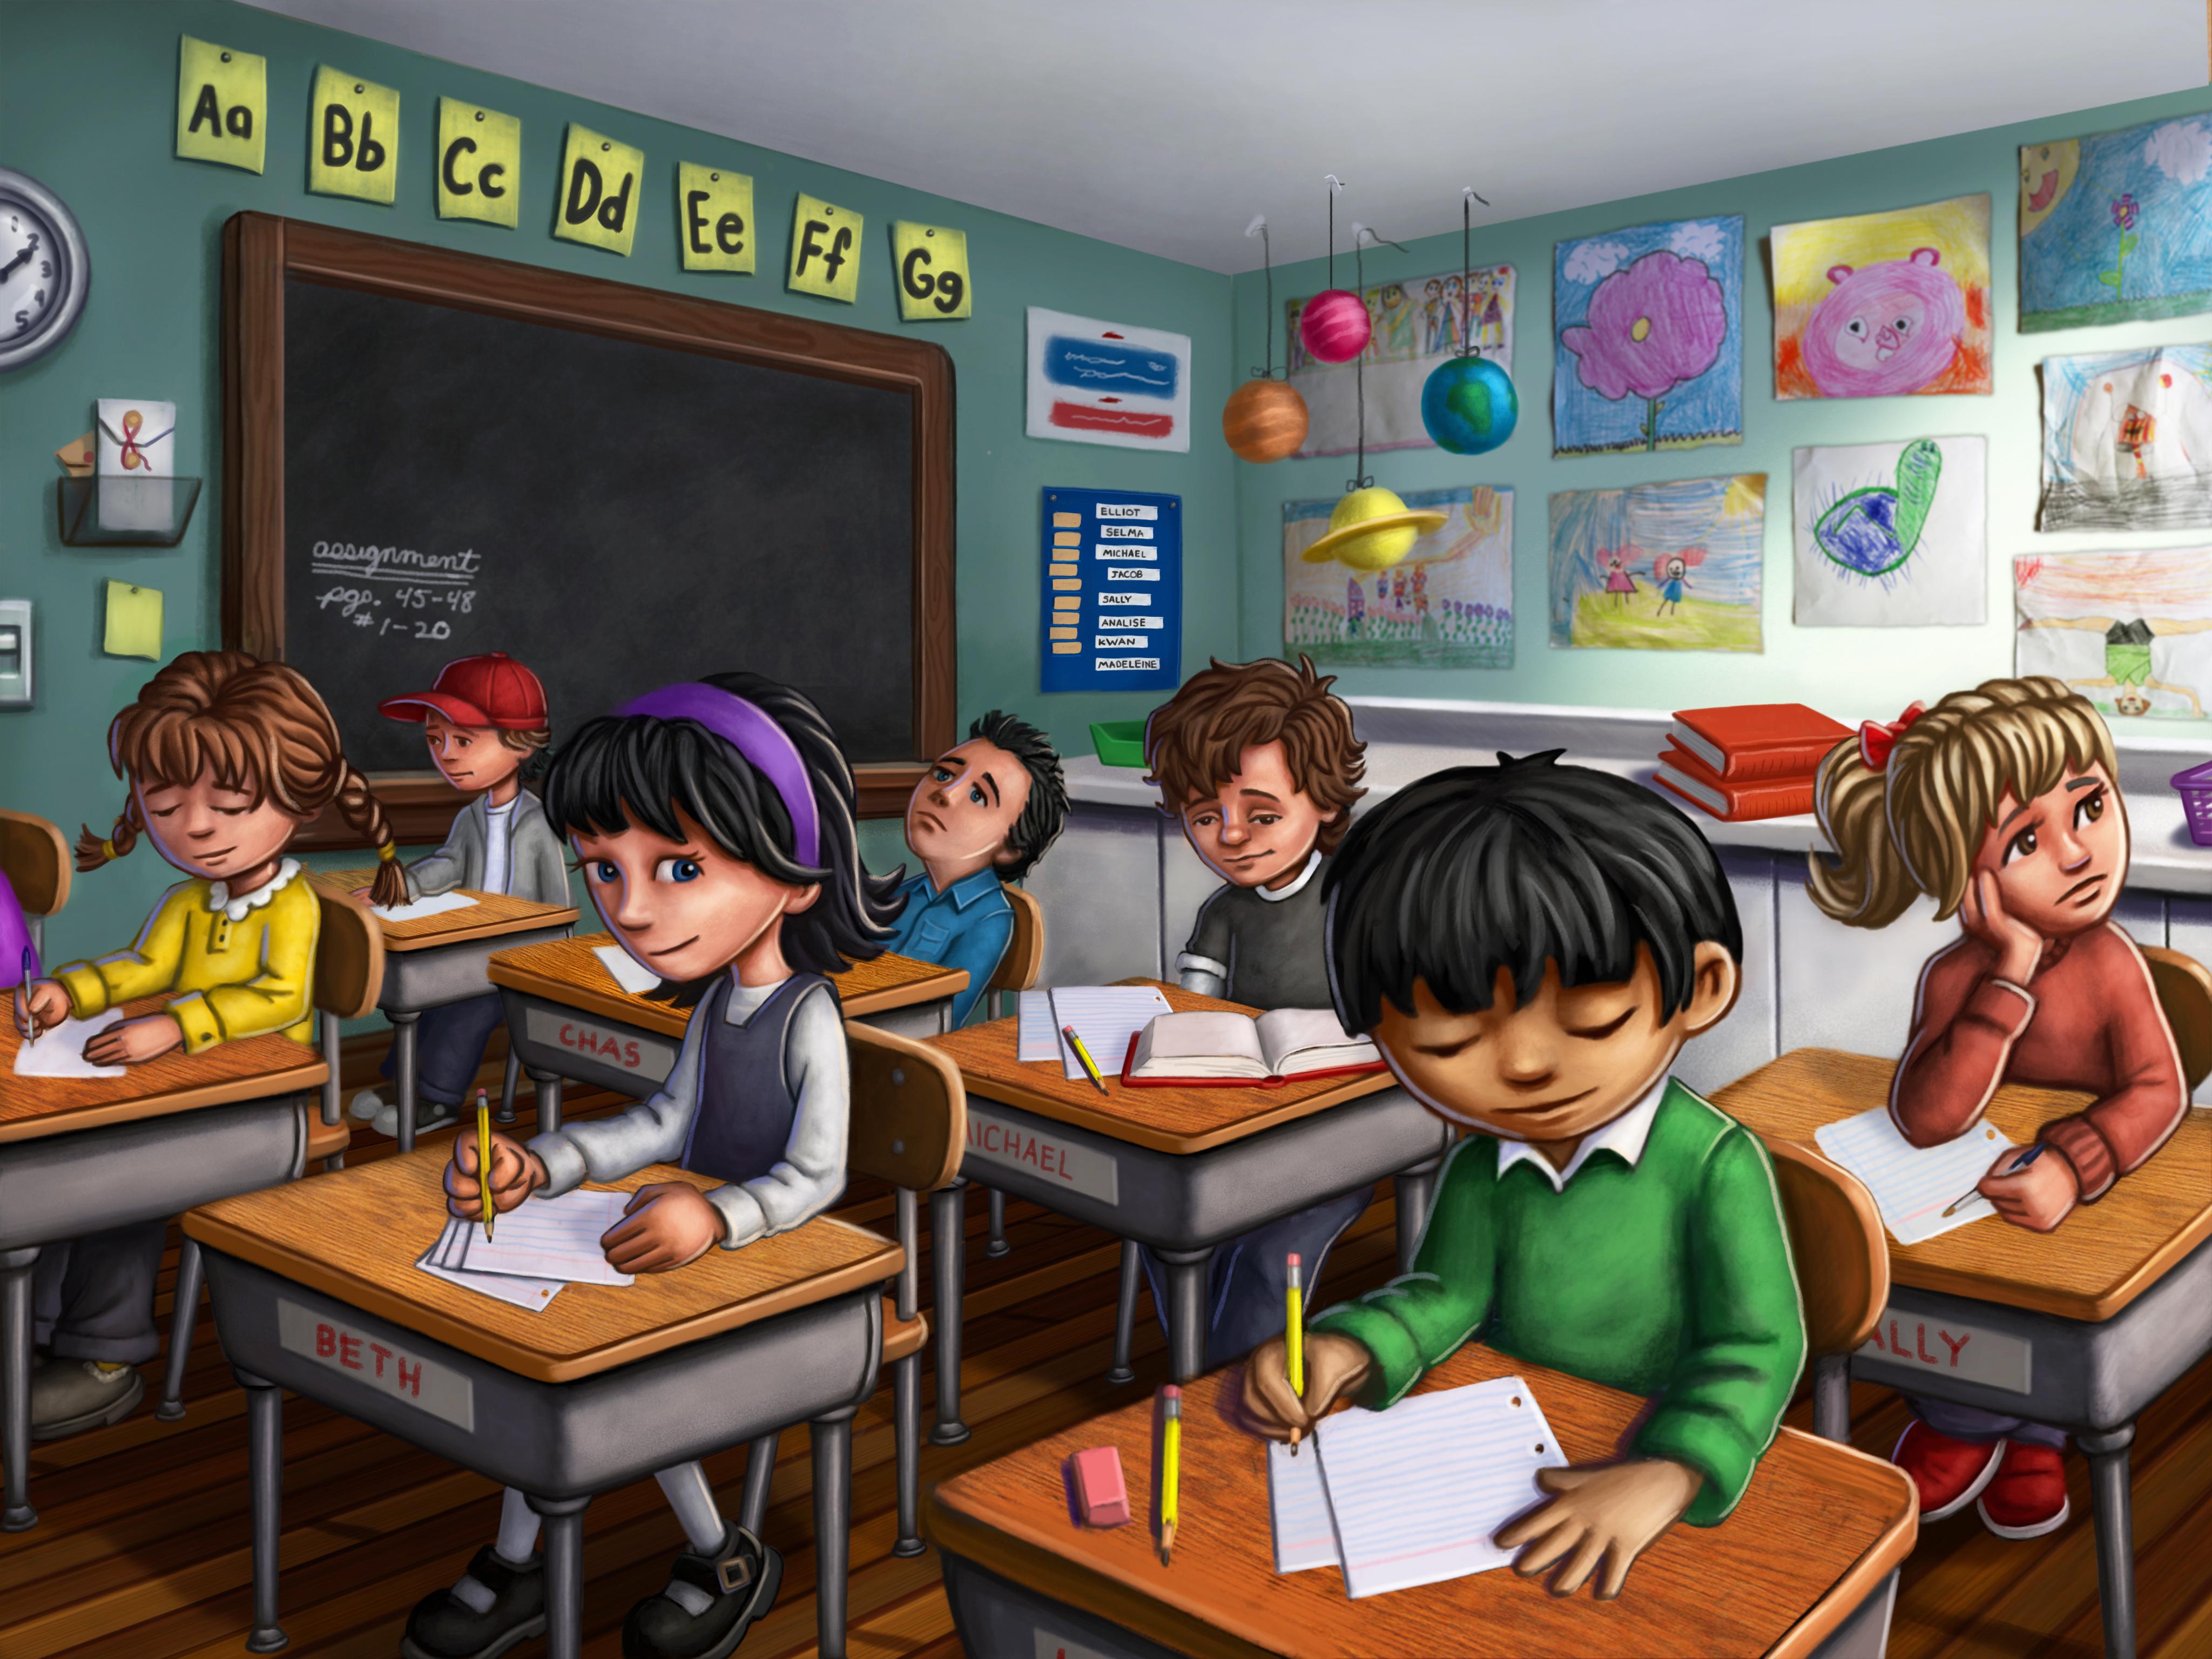 class clipart classroom-class clipart classroom-16